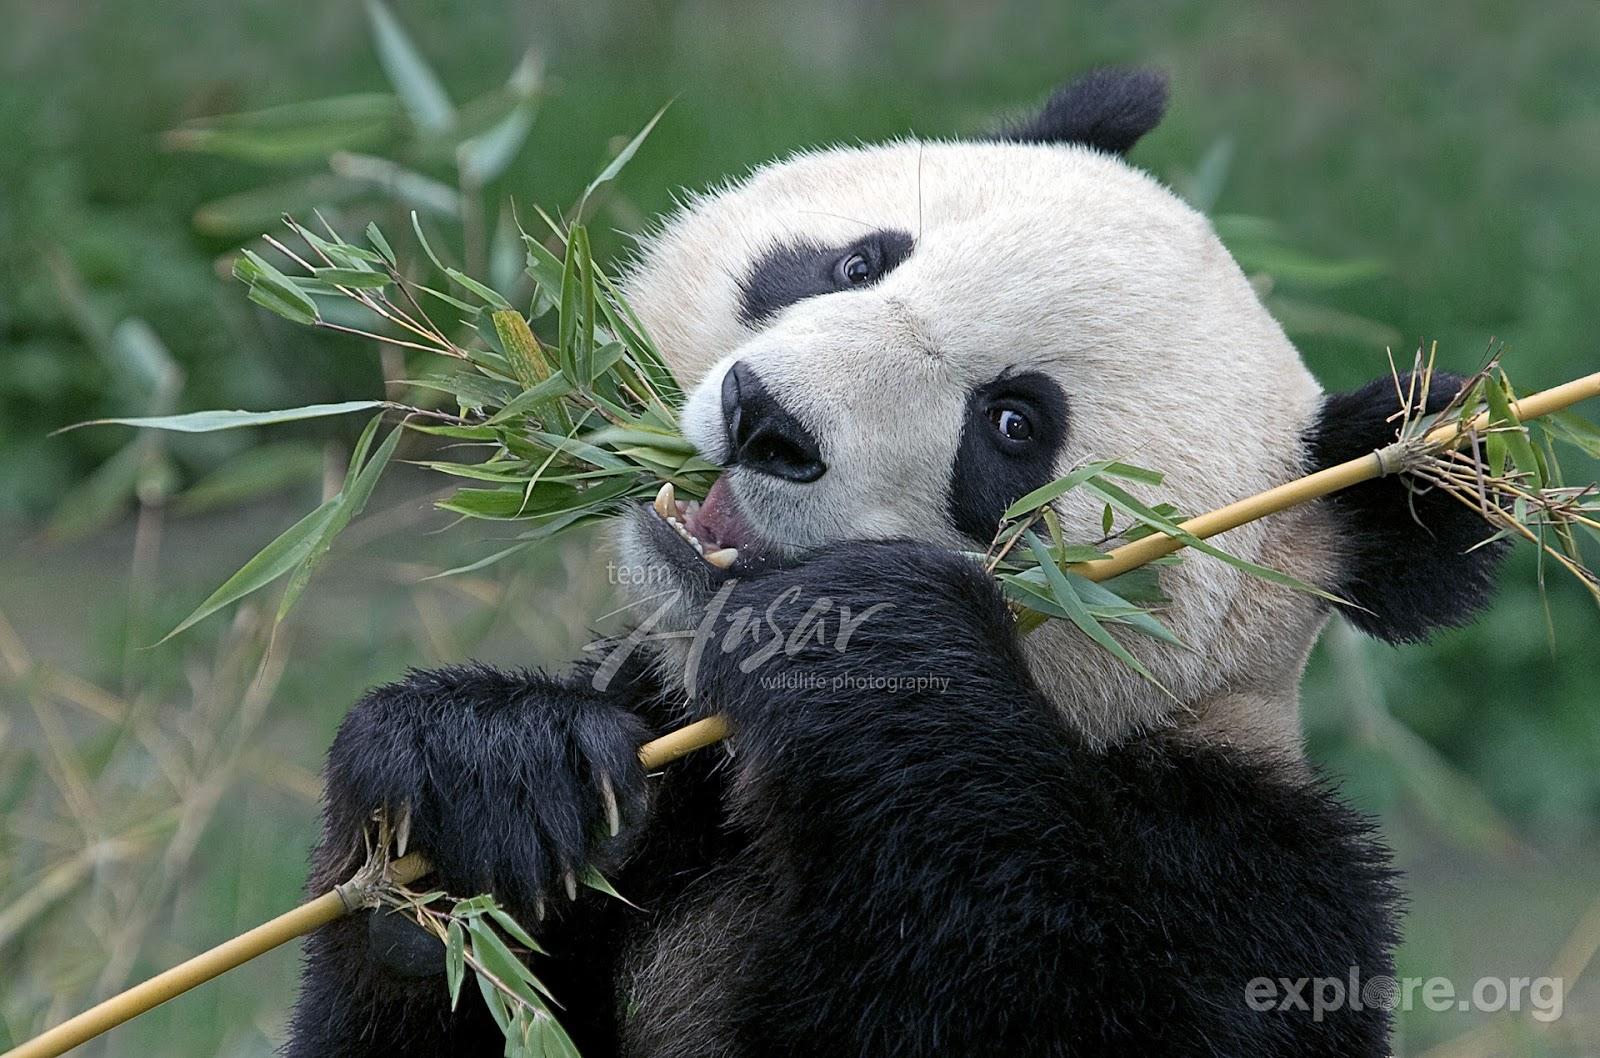 Isysgroup chengdu panda base